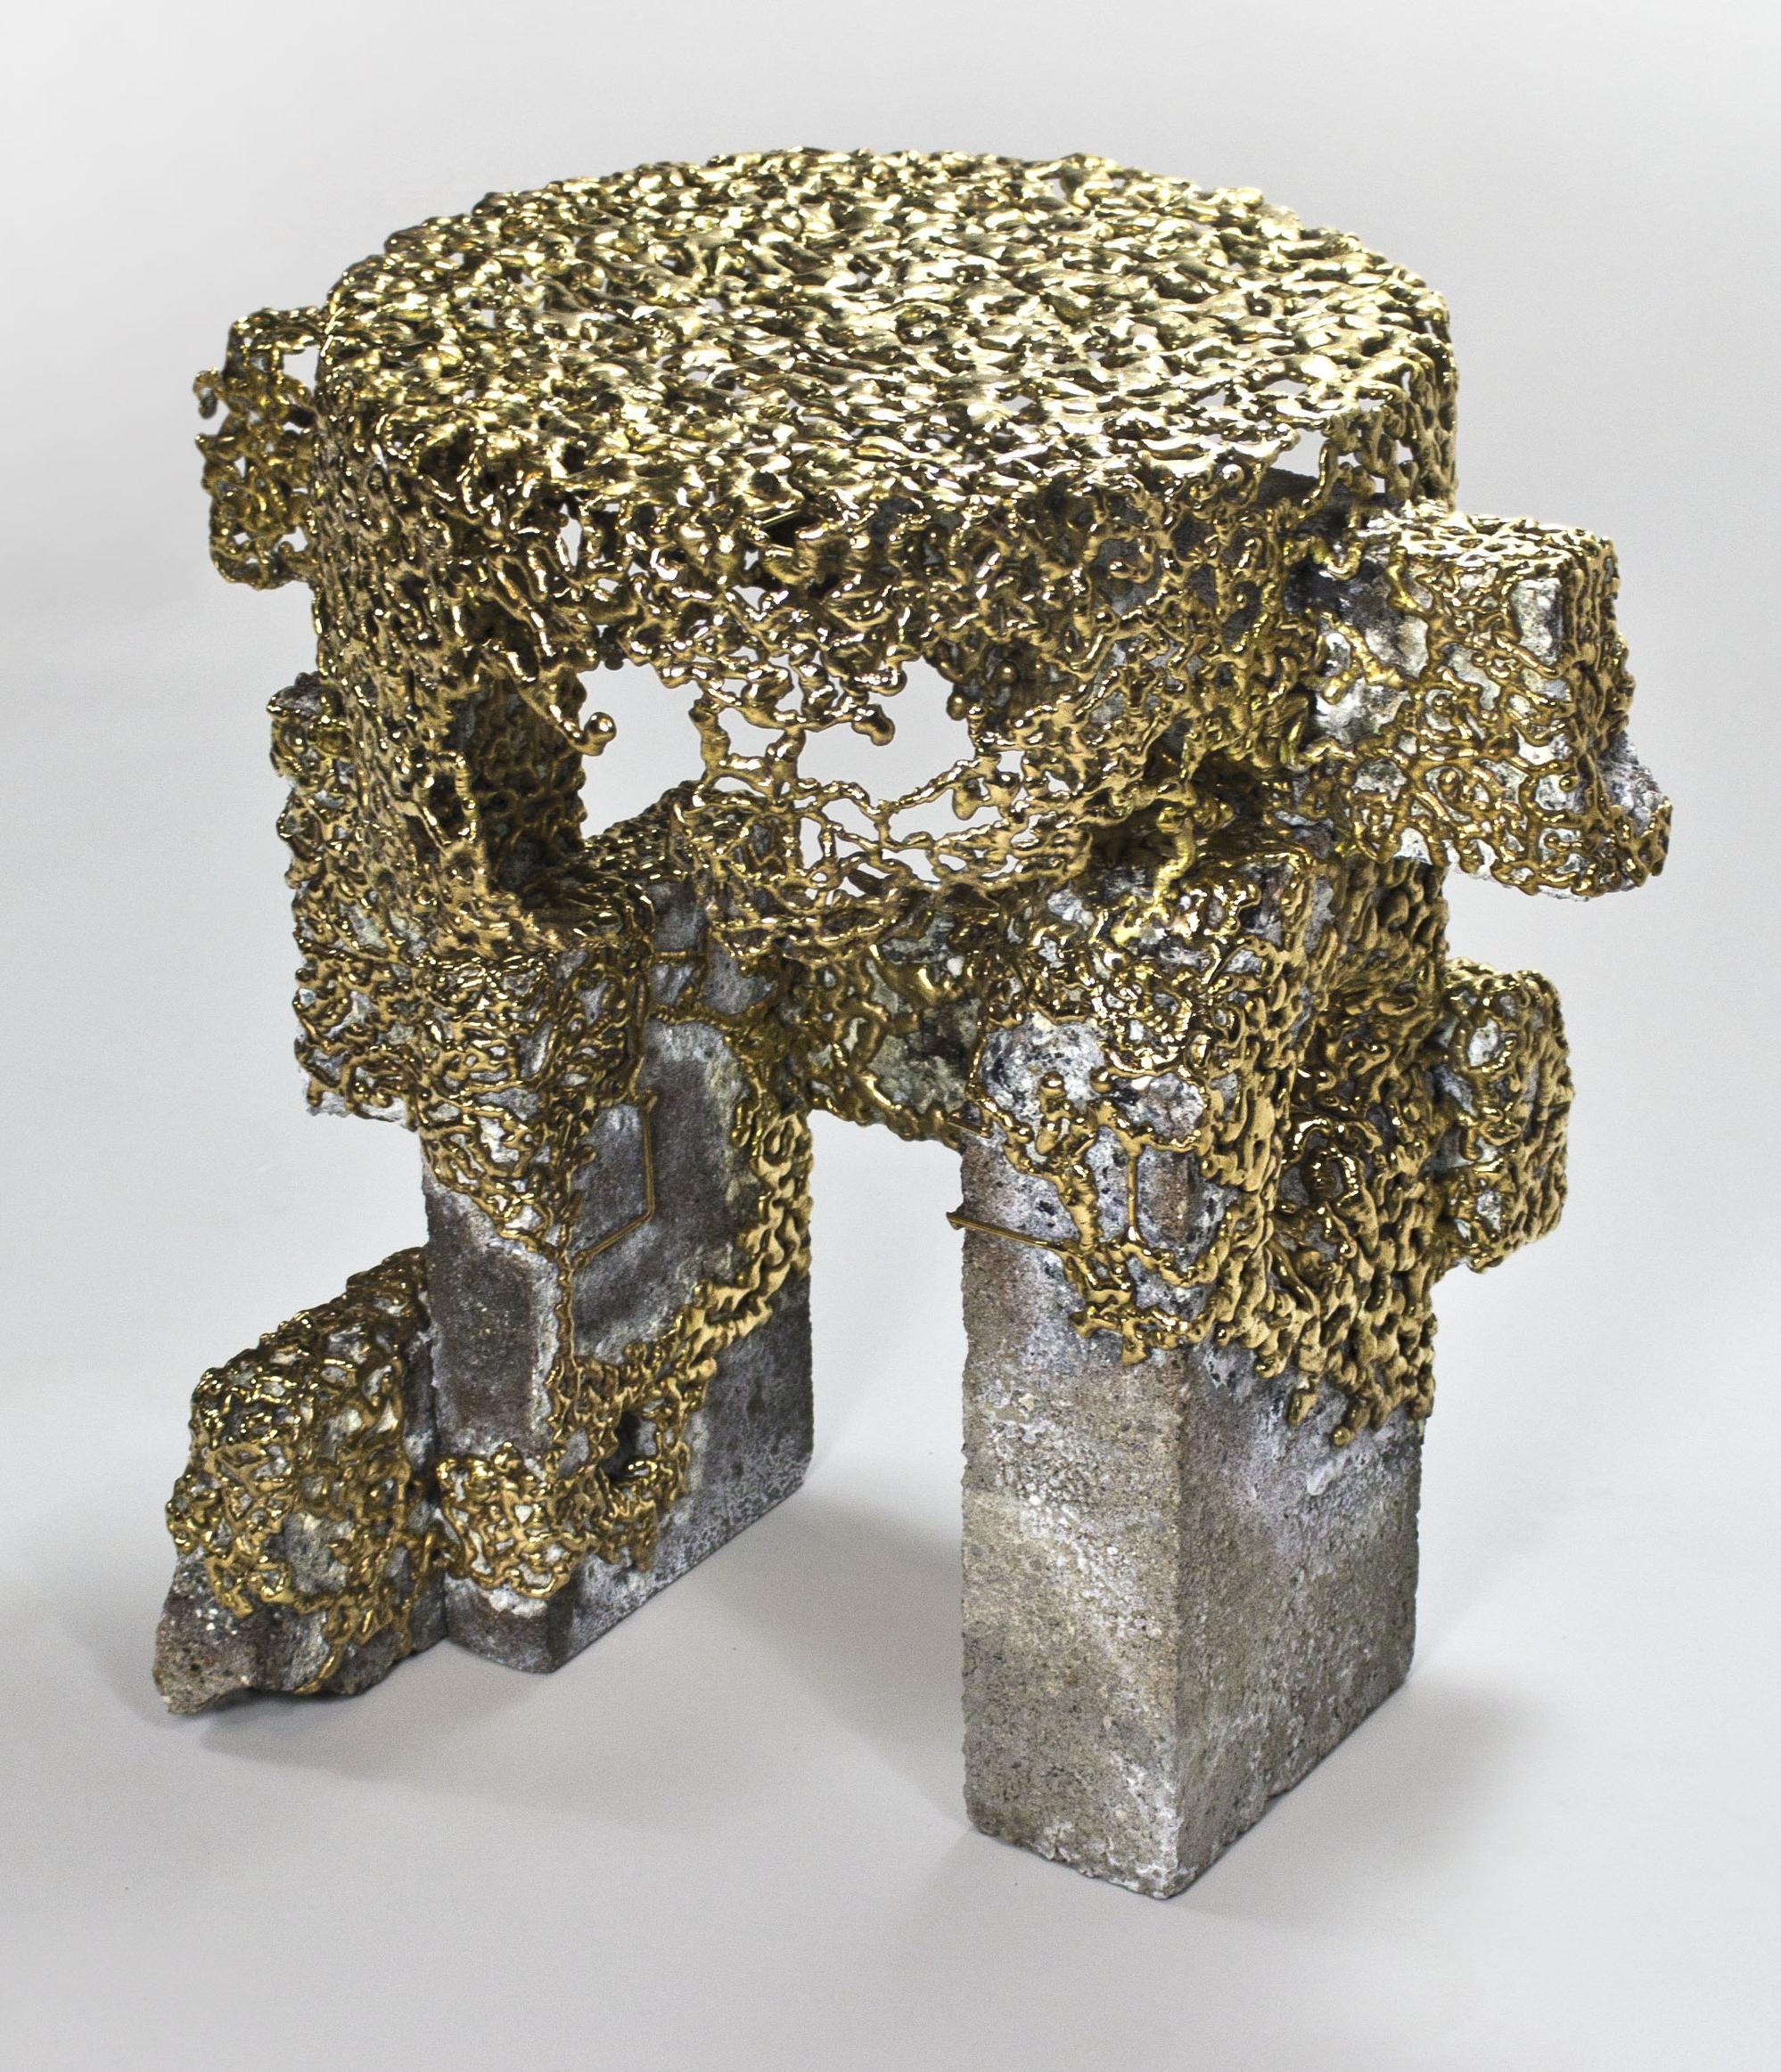 bronzed concrete end table, 2015